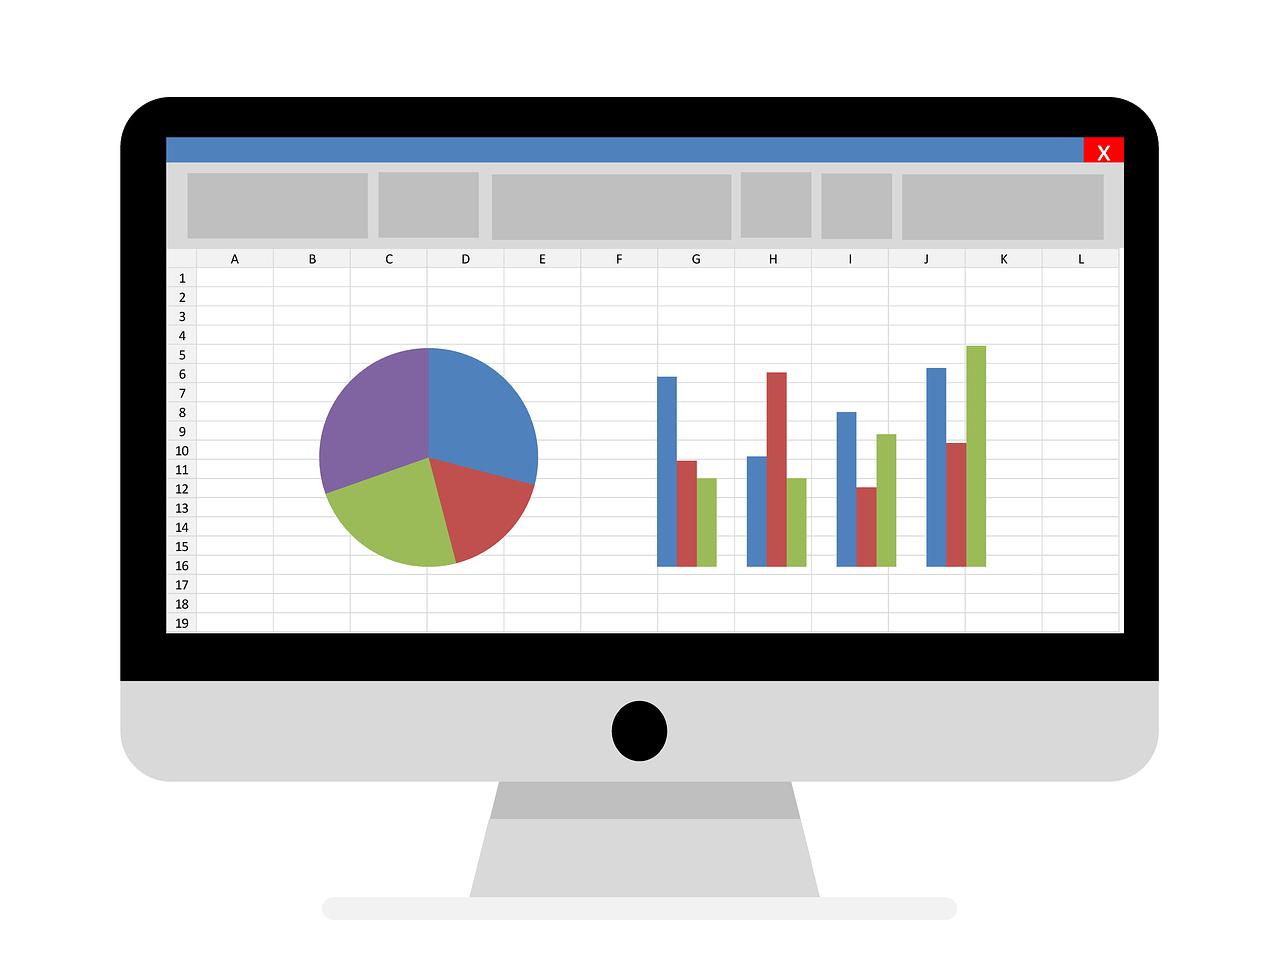 Excelでの操作の取り消しを素早く行う方法